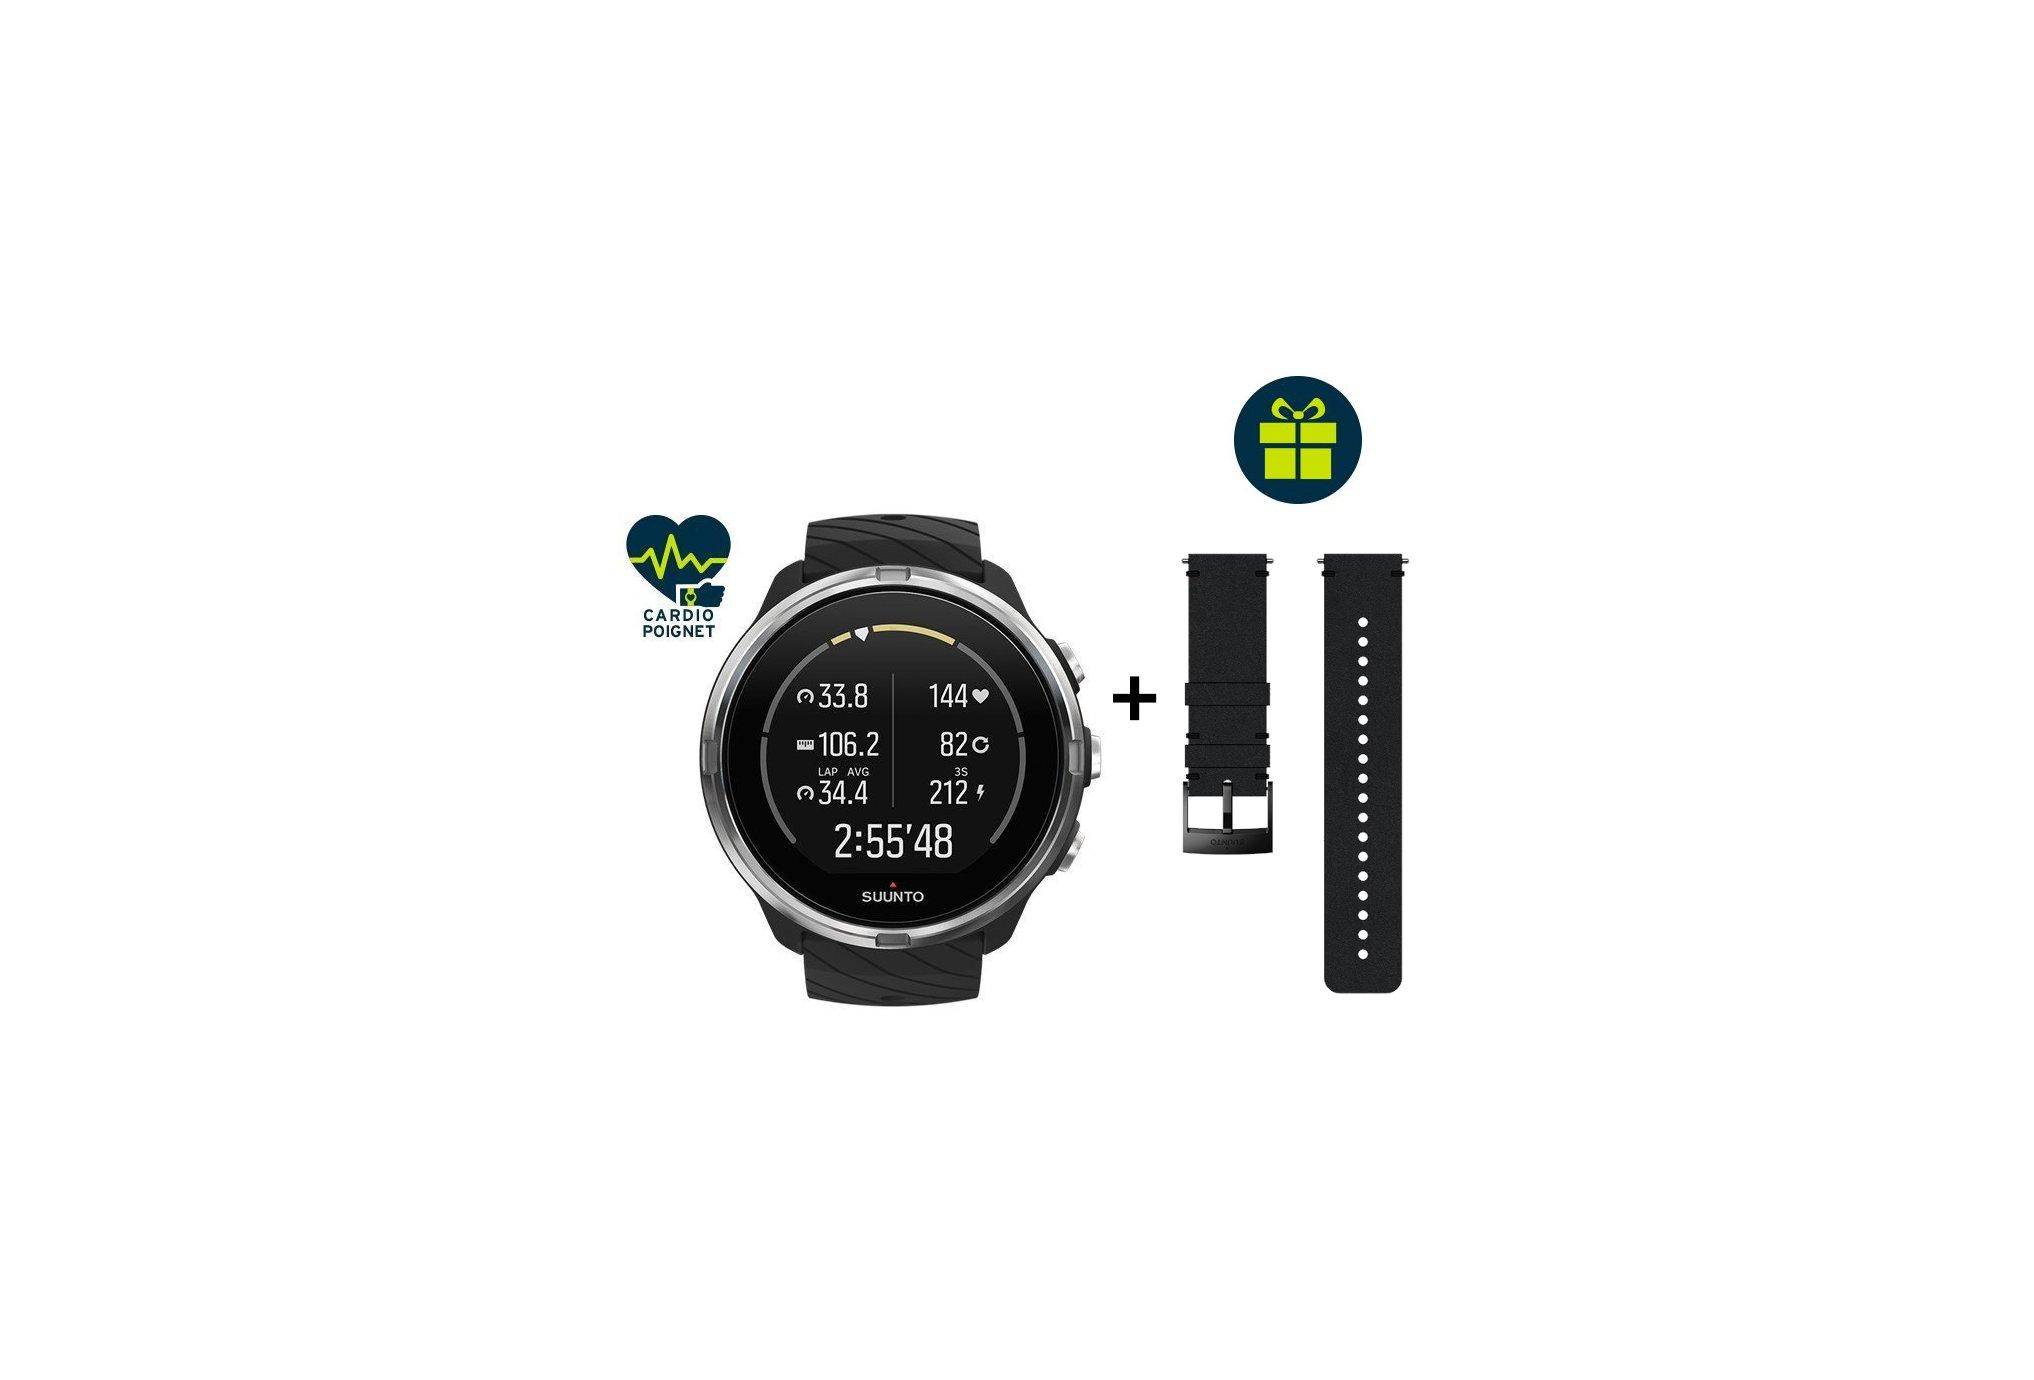 Suunto Pack reloj 9 Black + correa Urban 2 de cuero Cardio-Gps